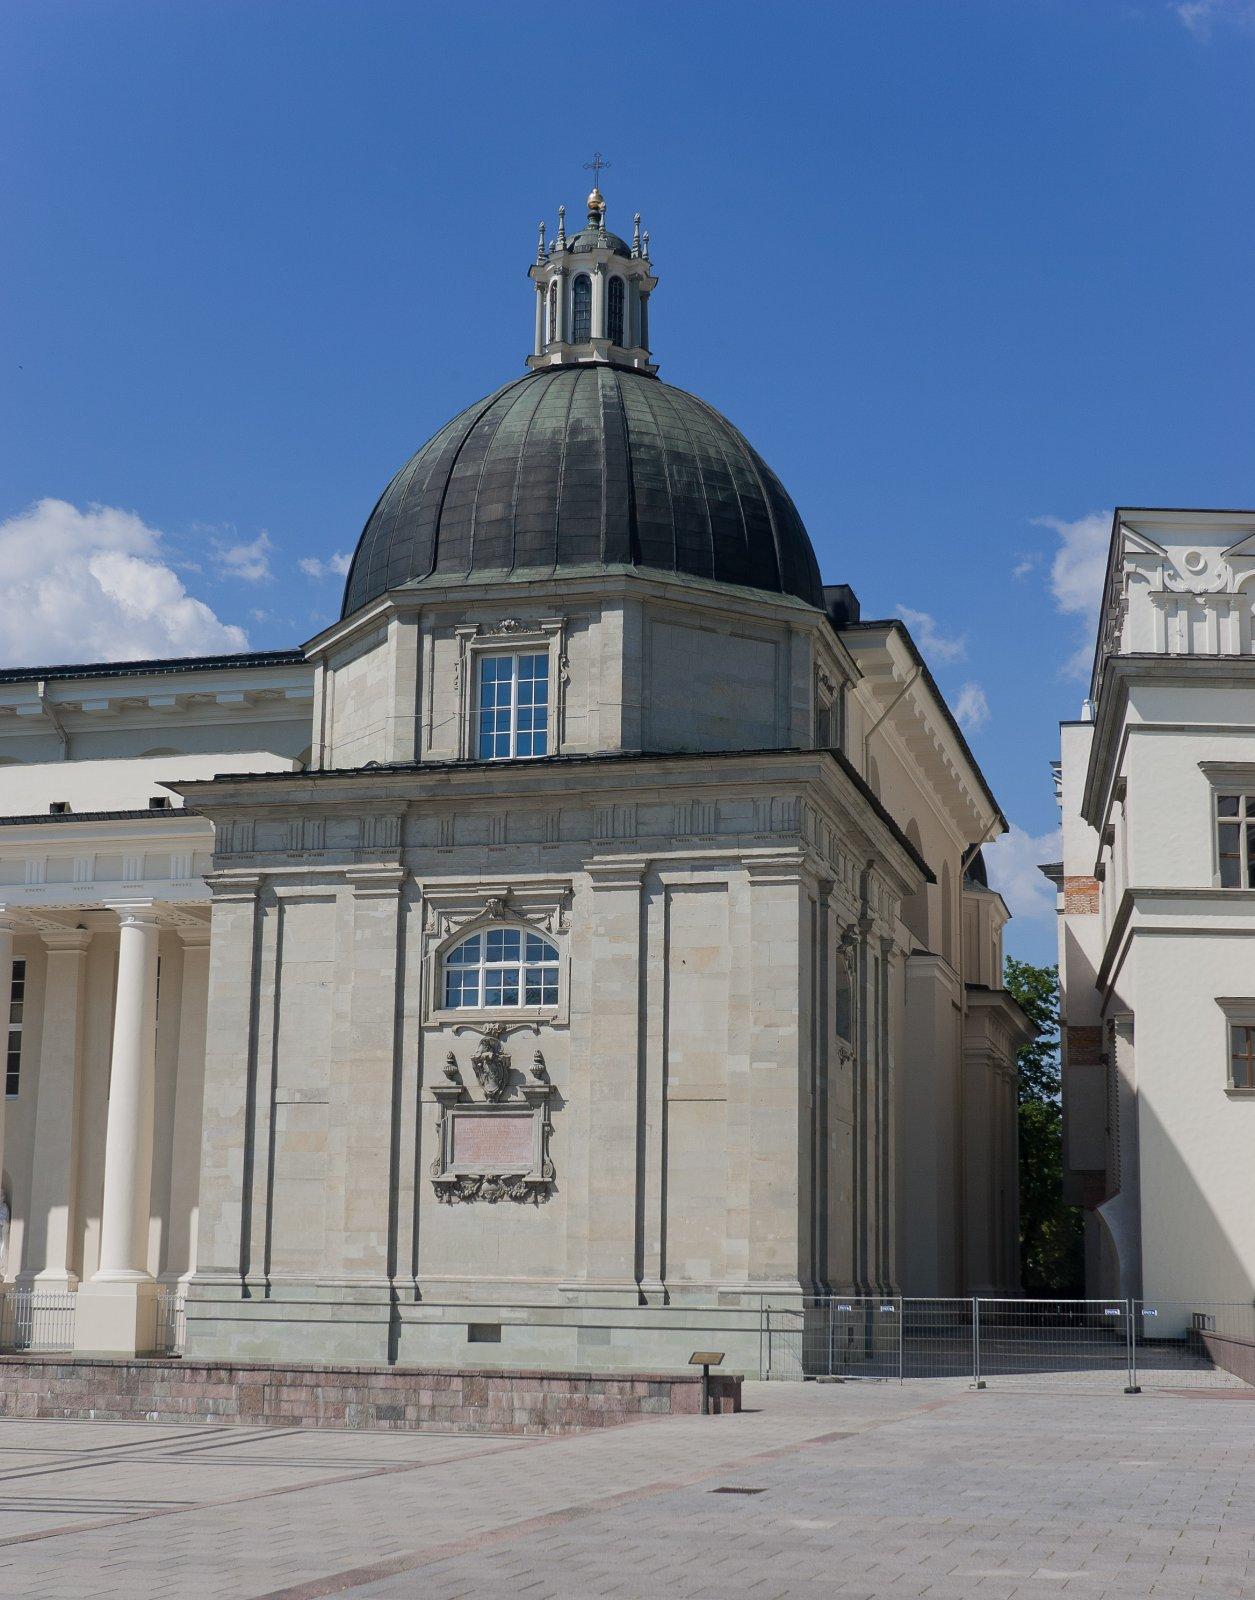 2 pav. Šv. Kazimiero koplyčia Vilniaus katedroje. Fot. M. Ambrazas, Communicare©